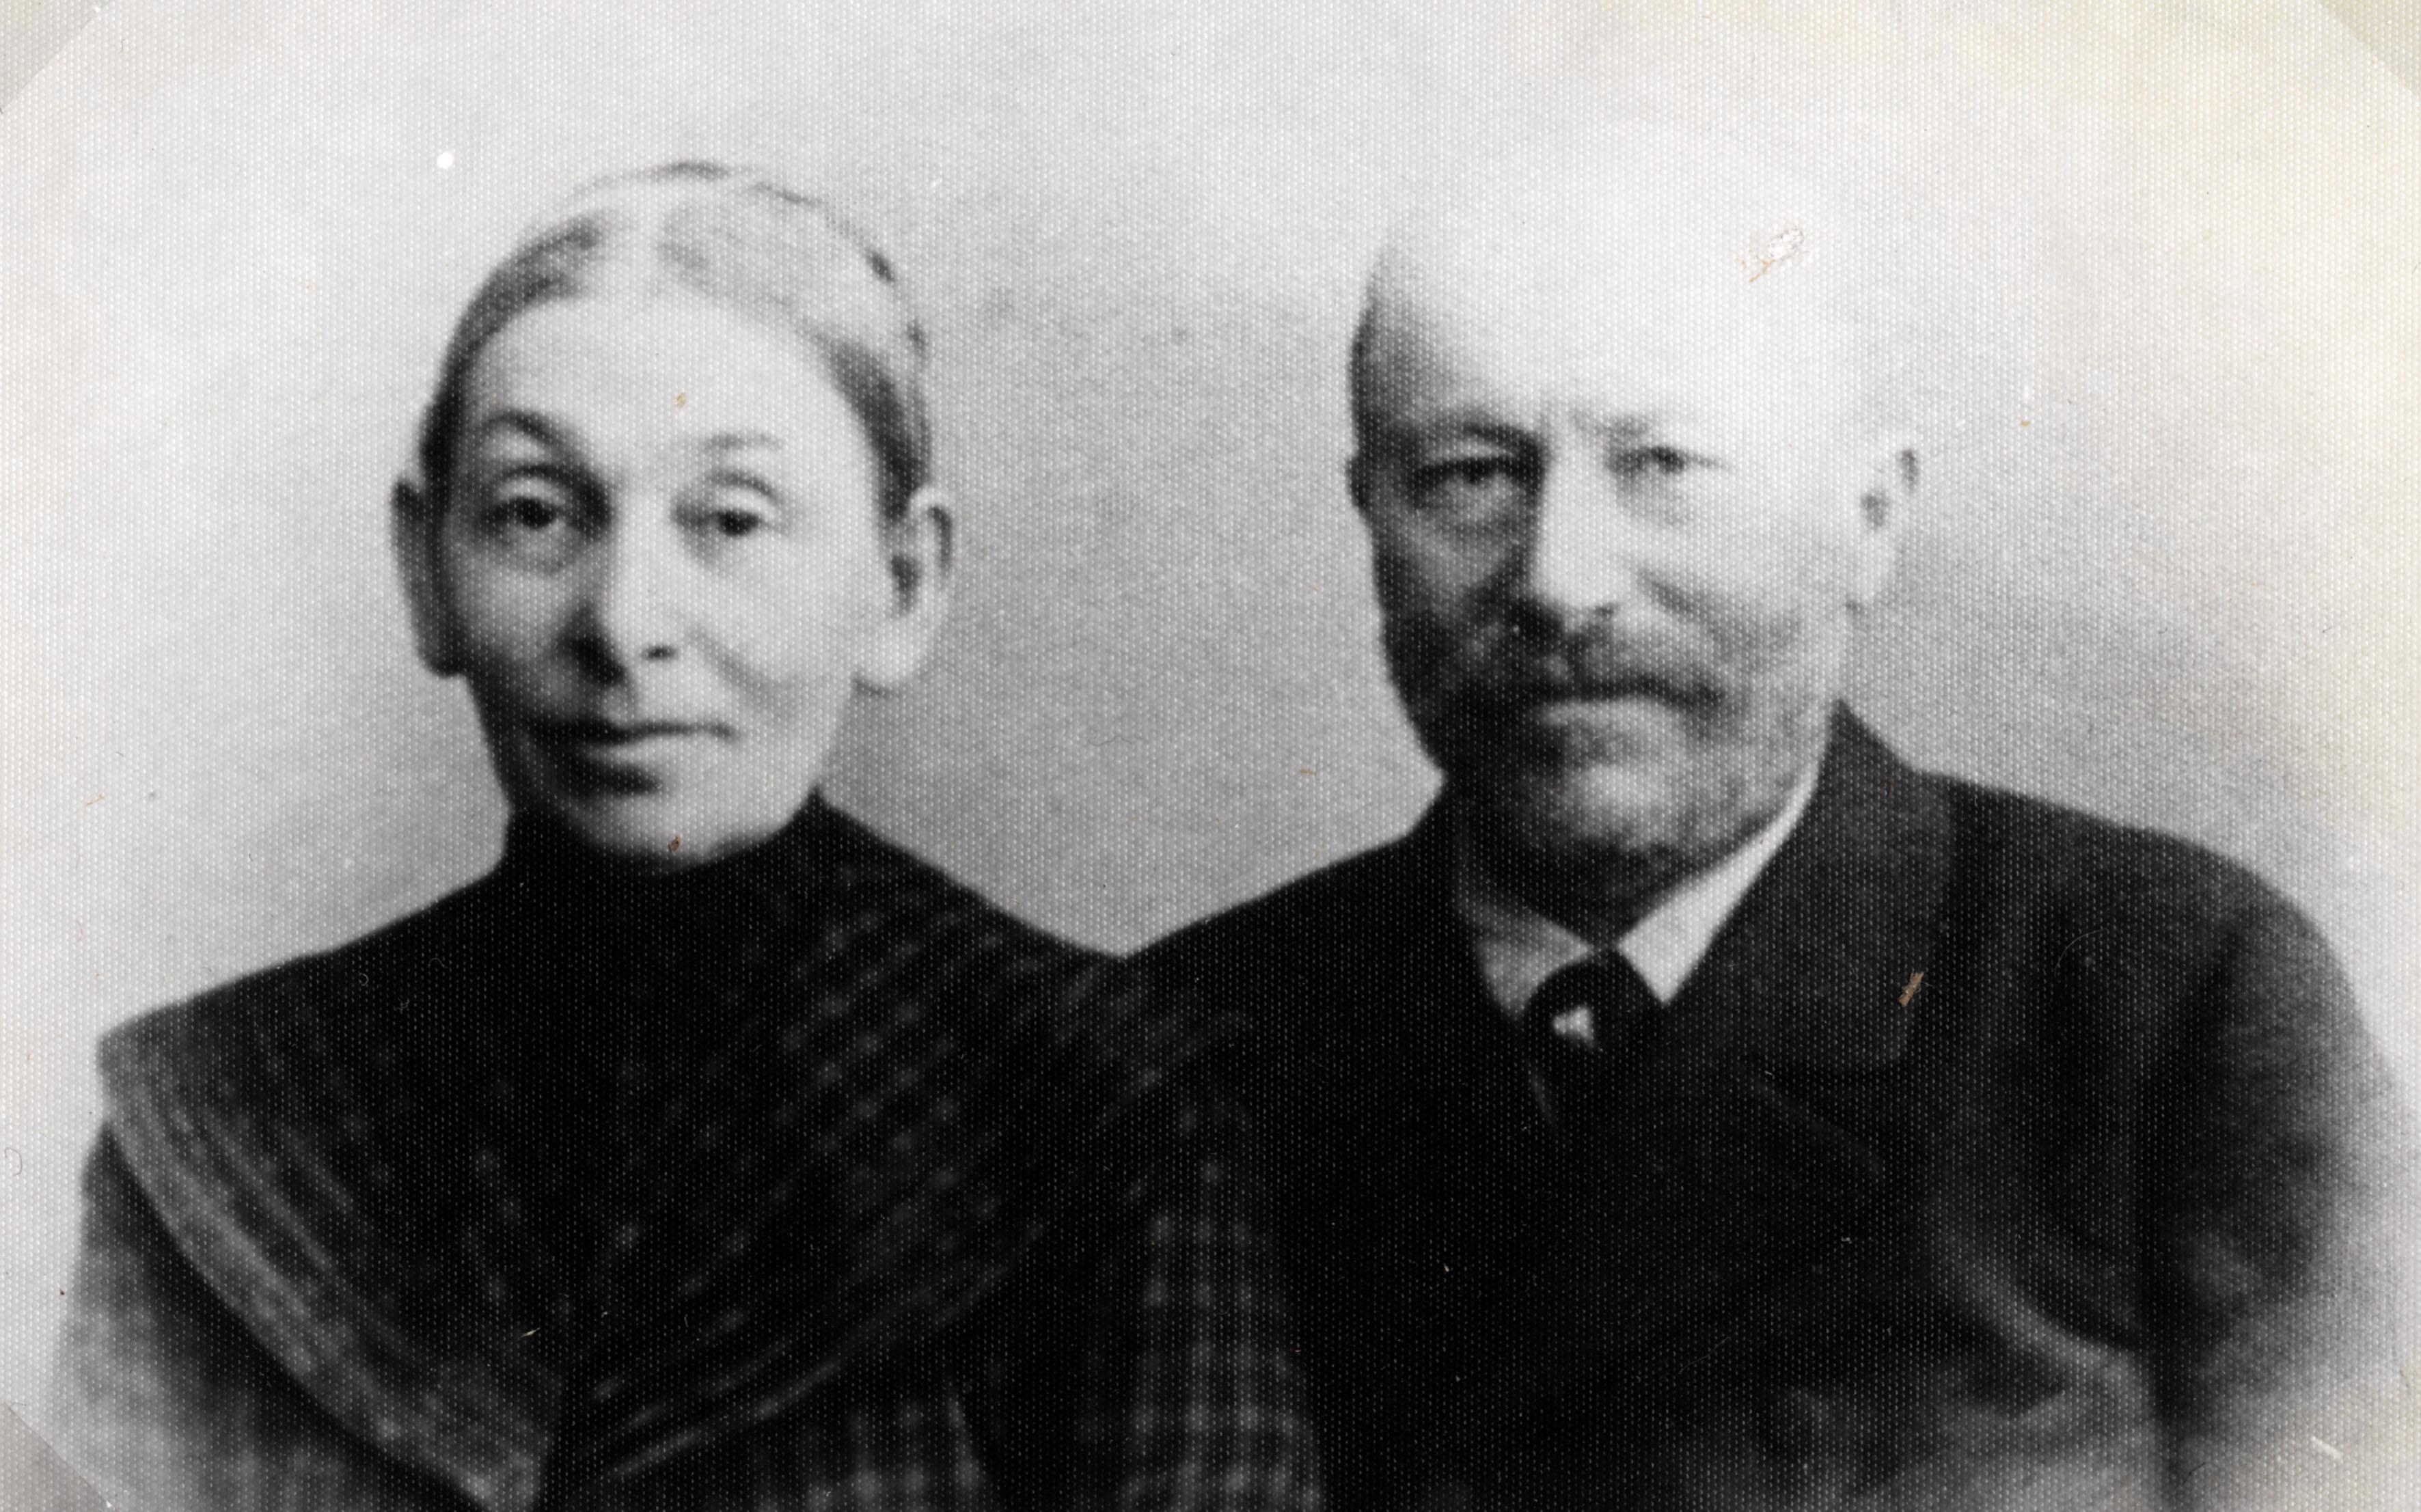 Rosa und Jakob Singer